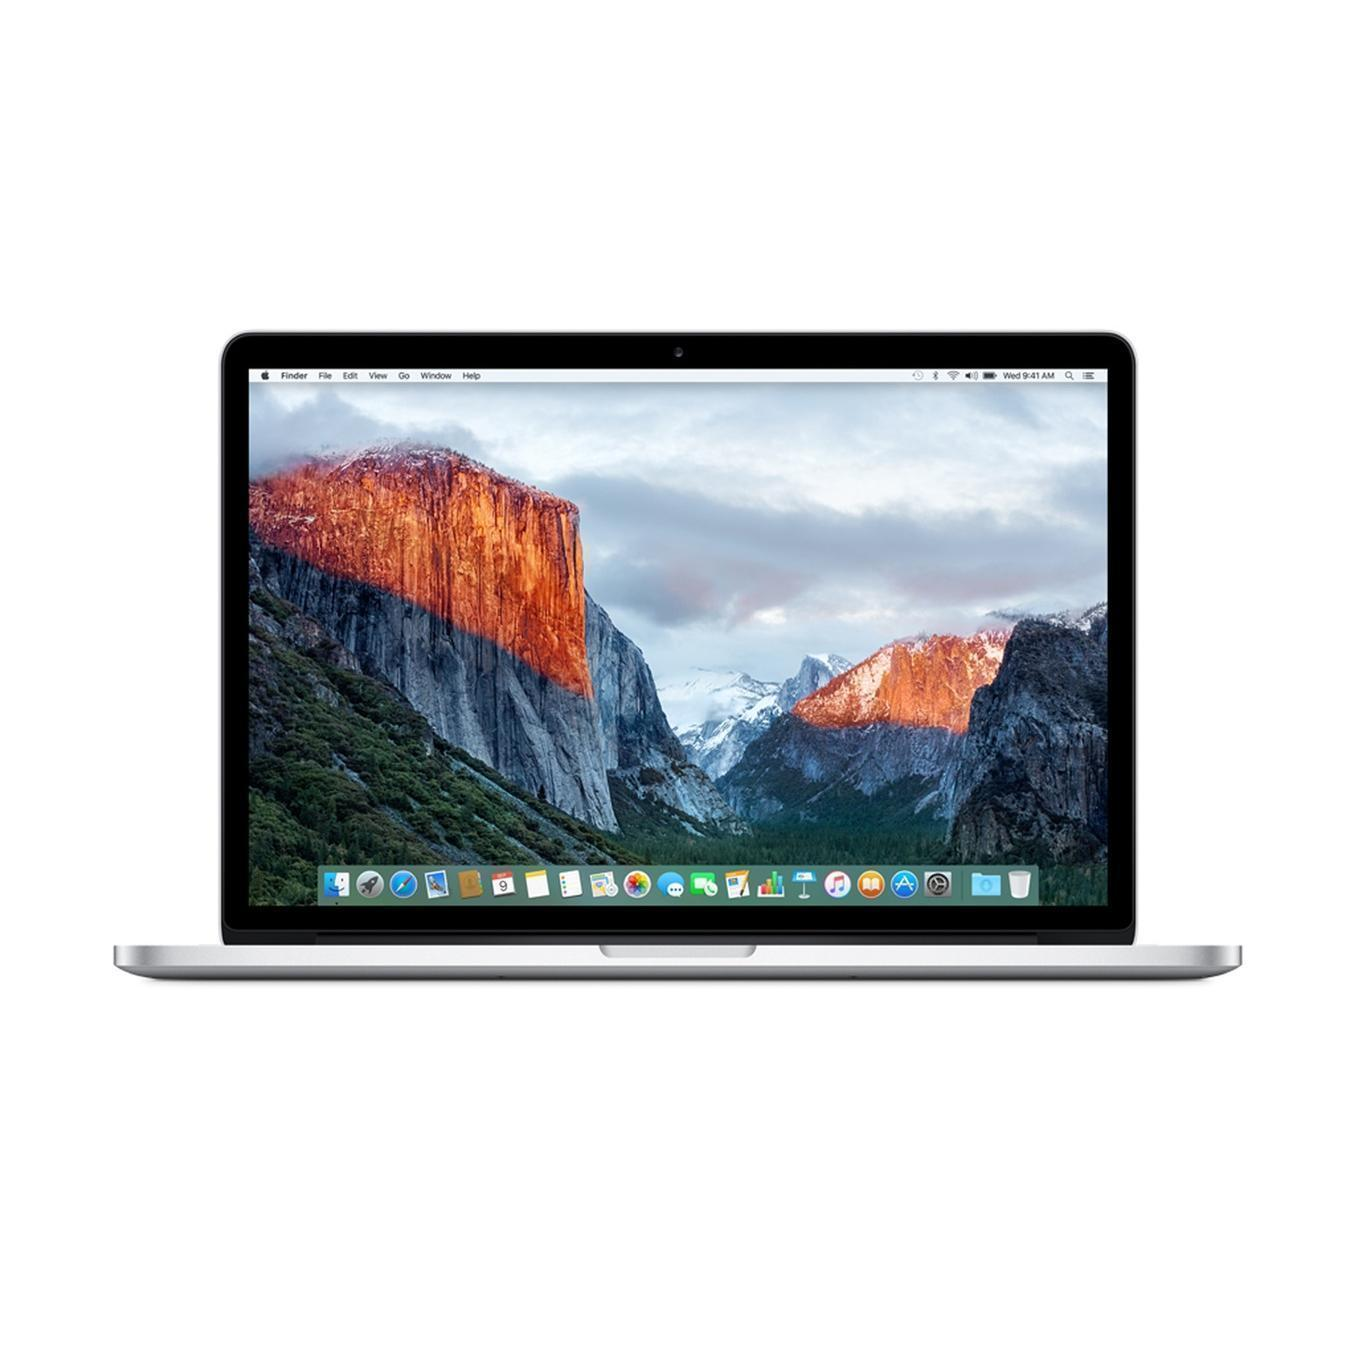 MacBook Pro Retina 15,4-tum (2014) - Core i7 - 16GB - SSD 128 GB QWERTY - Nederländska